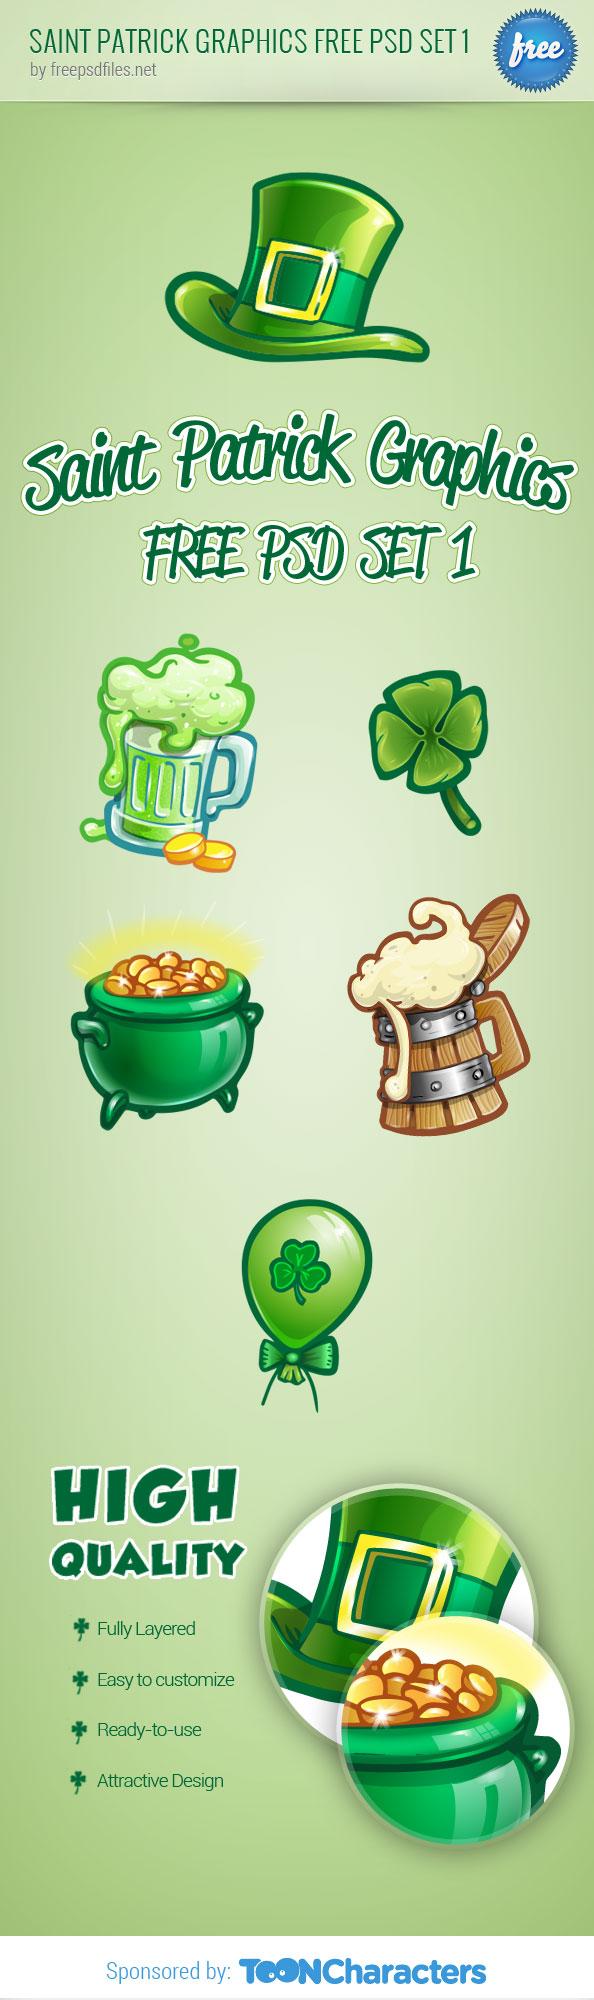 Saint Patrick Graphics Free PSD-Set 1